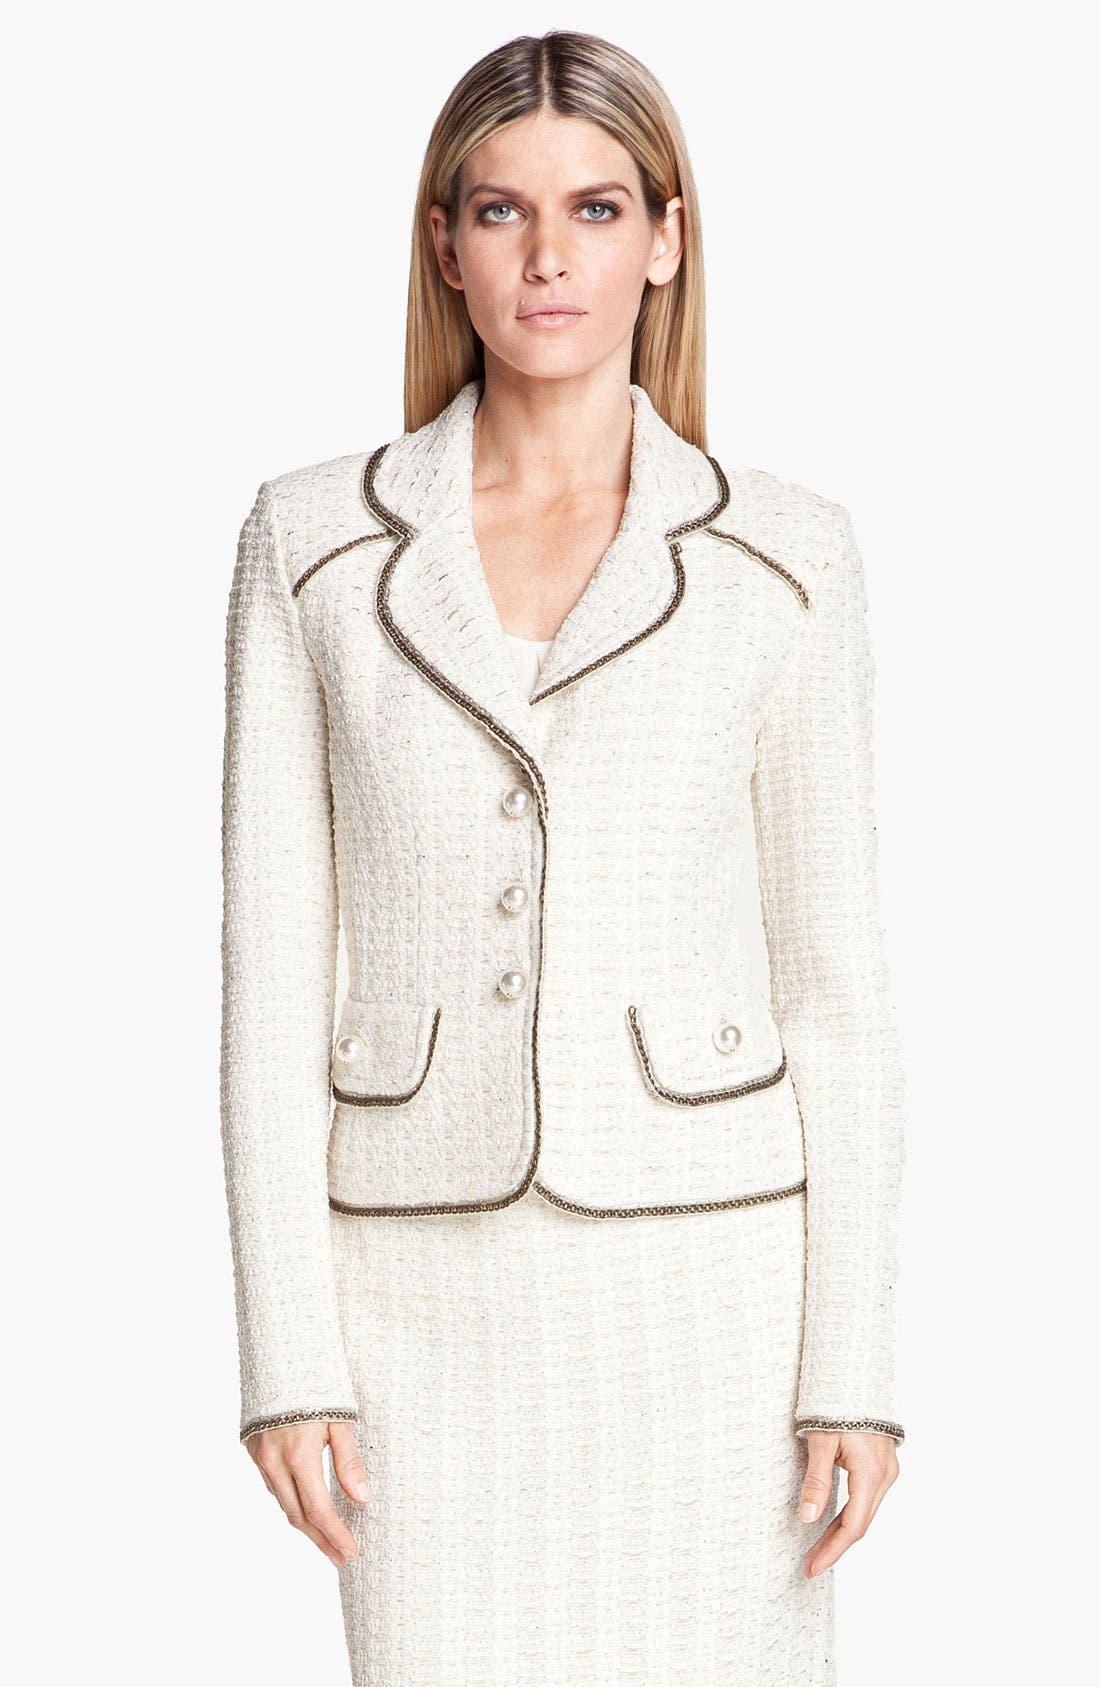 Main Image - St. John Collection Belgravia Tweed Jacket